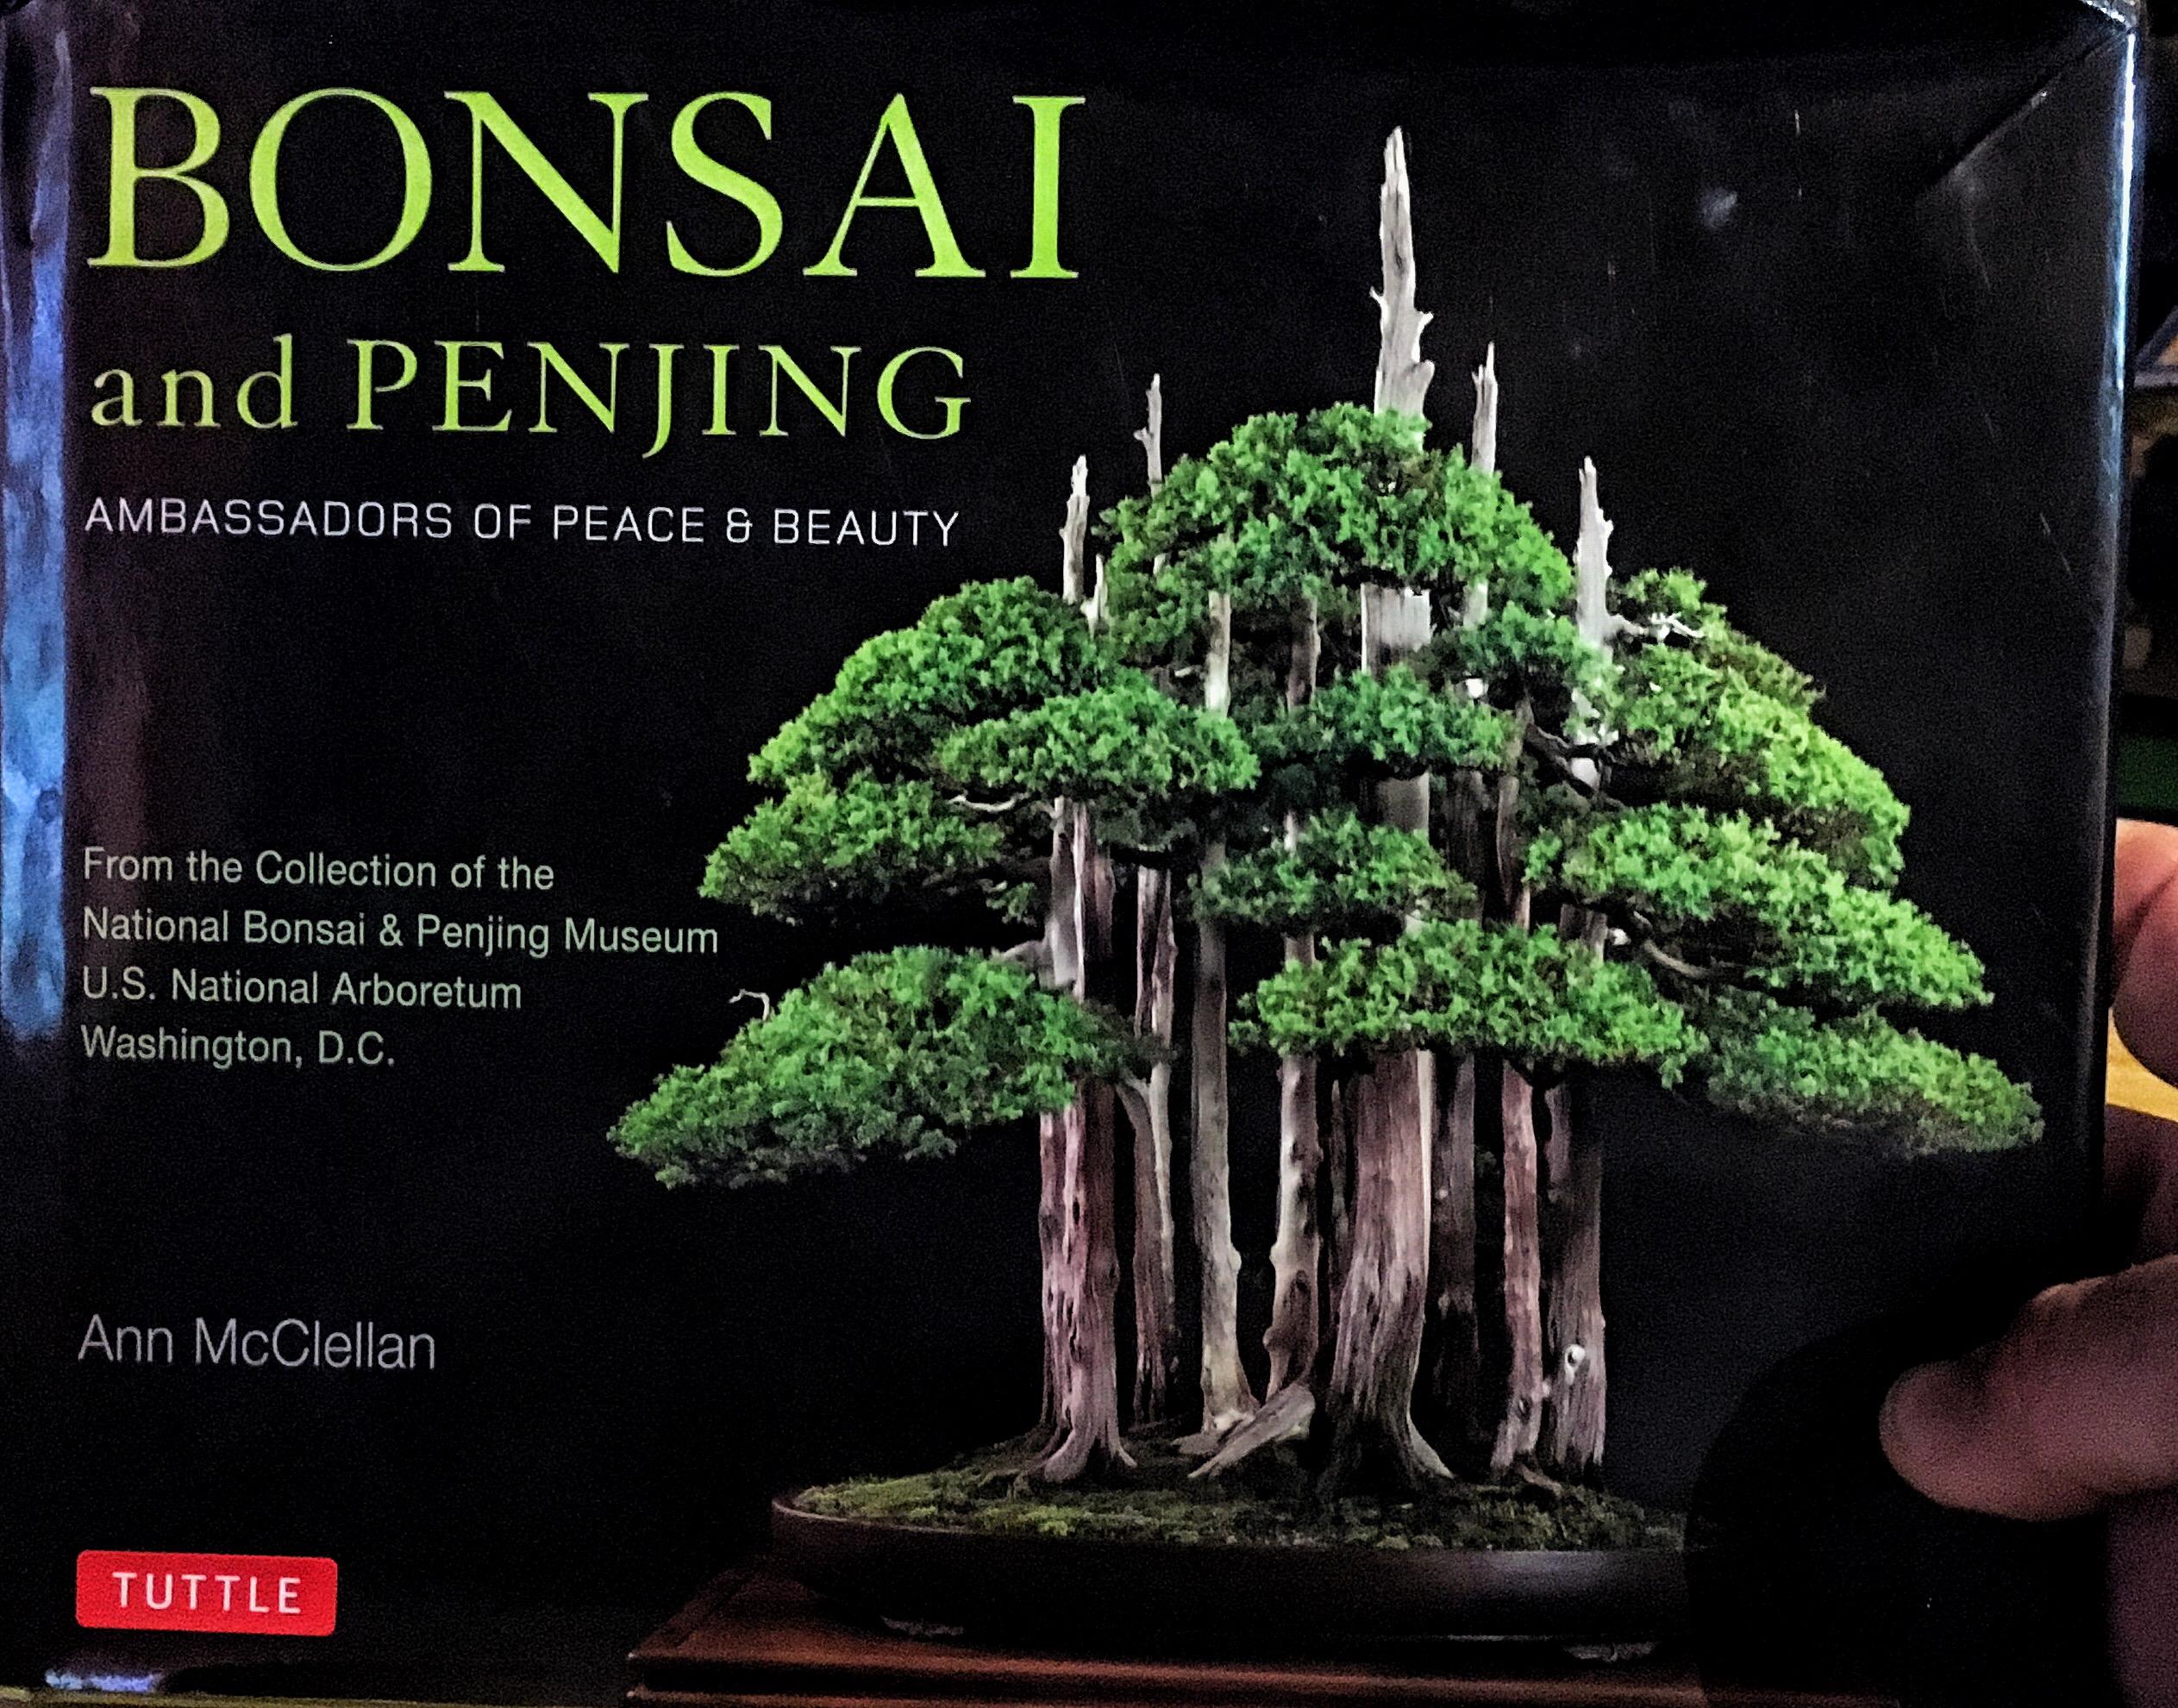 Bonsai and Penjing Ambassadors of Peace & Beauty Book review